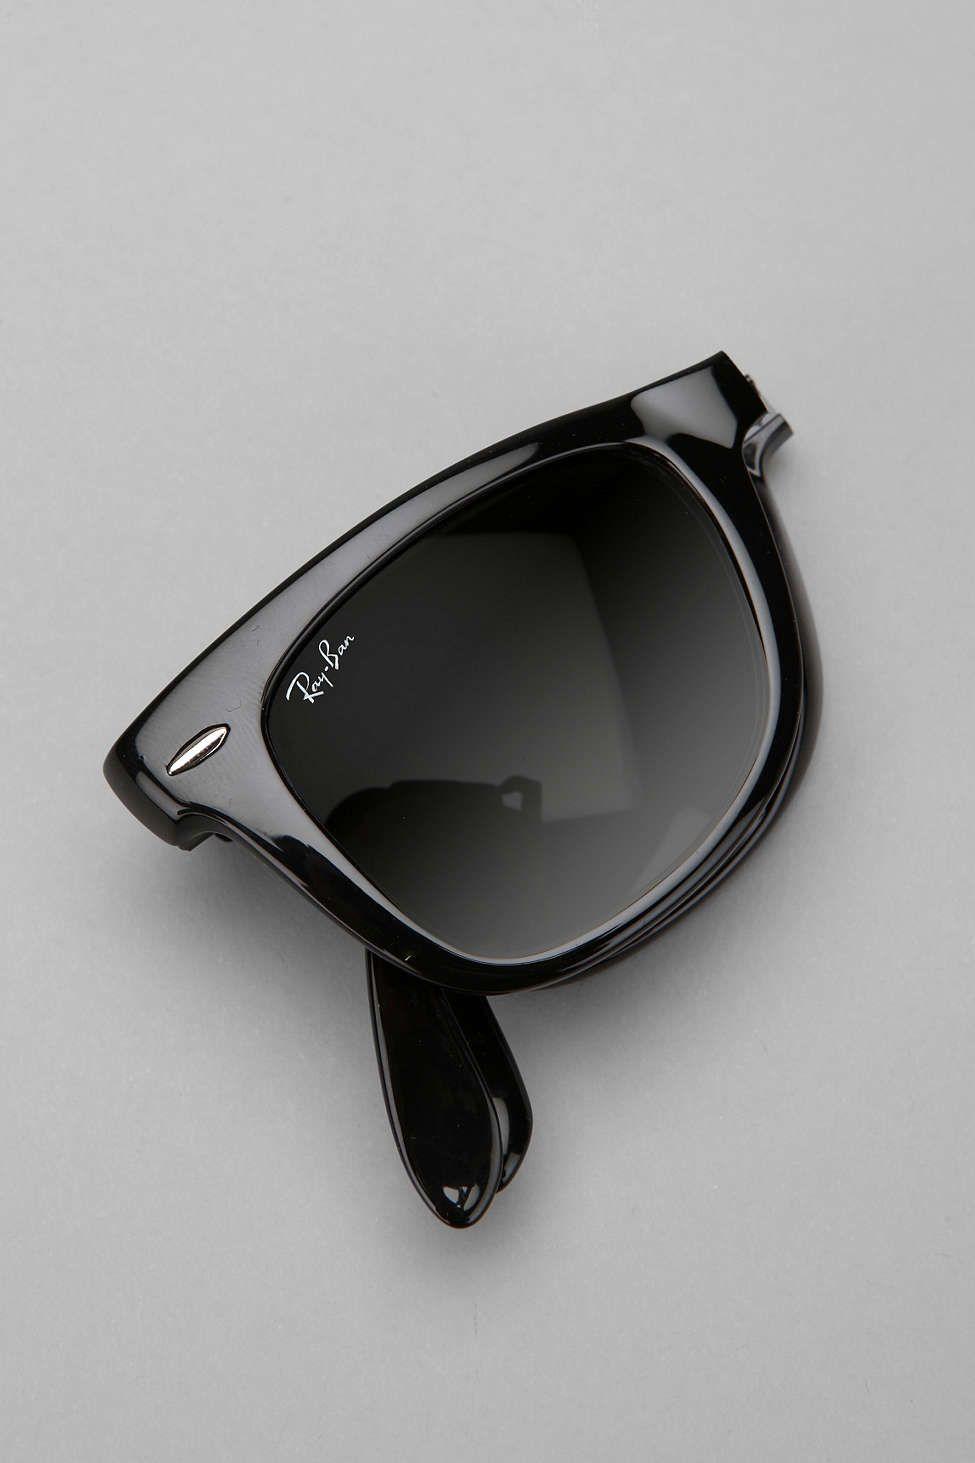 Ray-Ban Folding Wayfarer Sunglasses  - Urban Outfitters